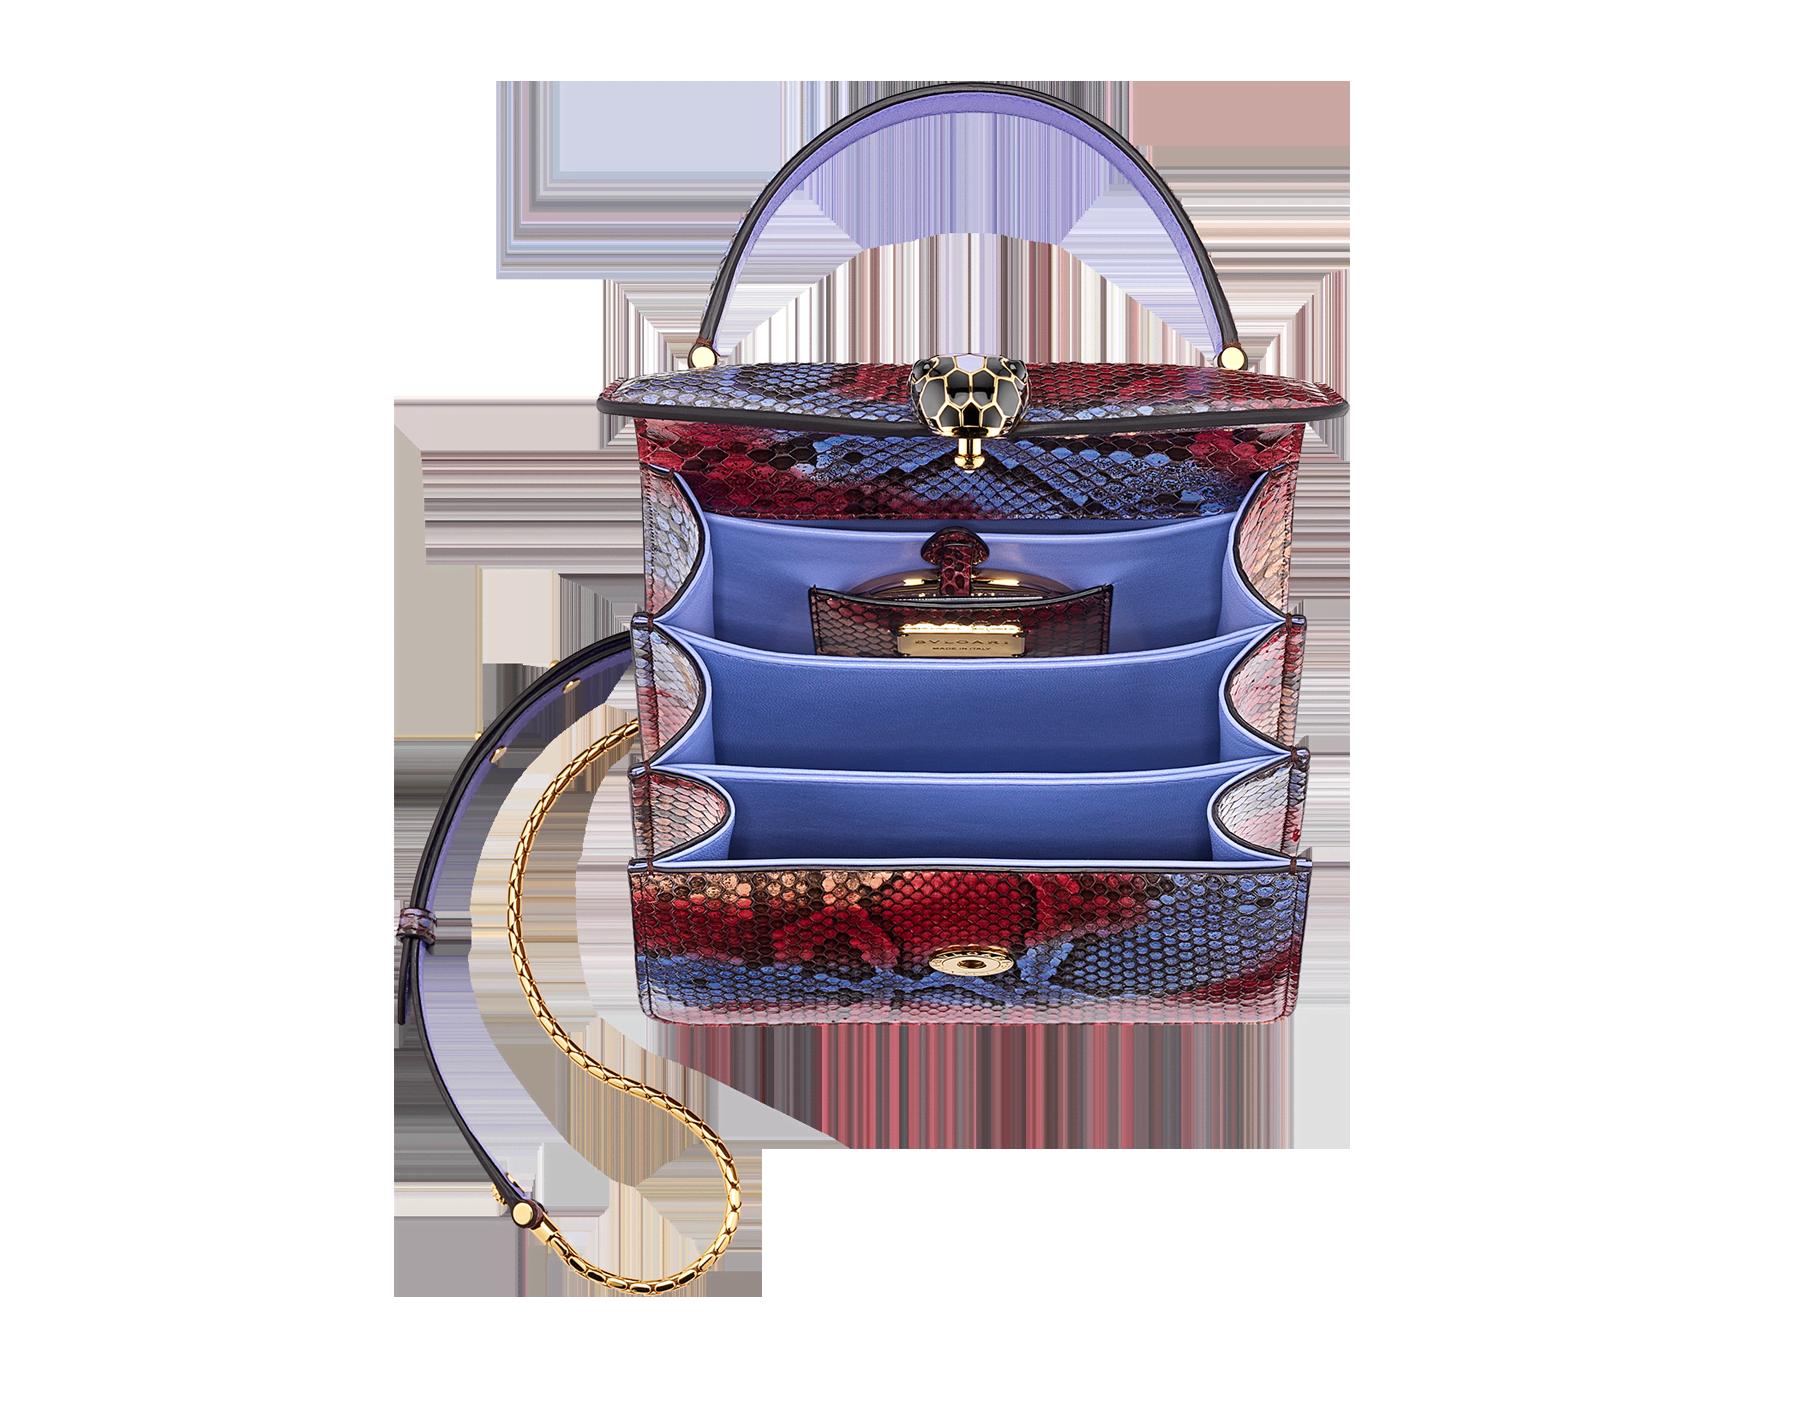 Serpenti Forever 手提包,採用多色手工印染 Chimera 蟒皮,Lavander Amethyst 紫丁香色 Nappa 軟面皮襯裡。迷人的金色黃銅蛇頭扣環飾以黑色和 Lavander 紫丁香色琺瑯,蛇眼鑲飾黑色縞瑪瑙。 290579 image 2